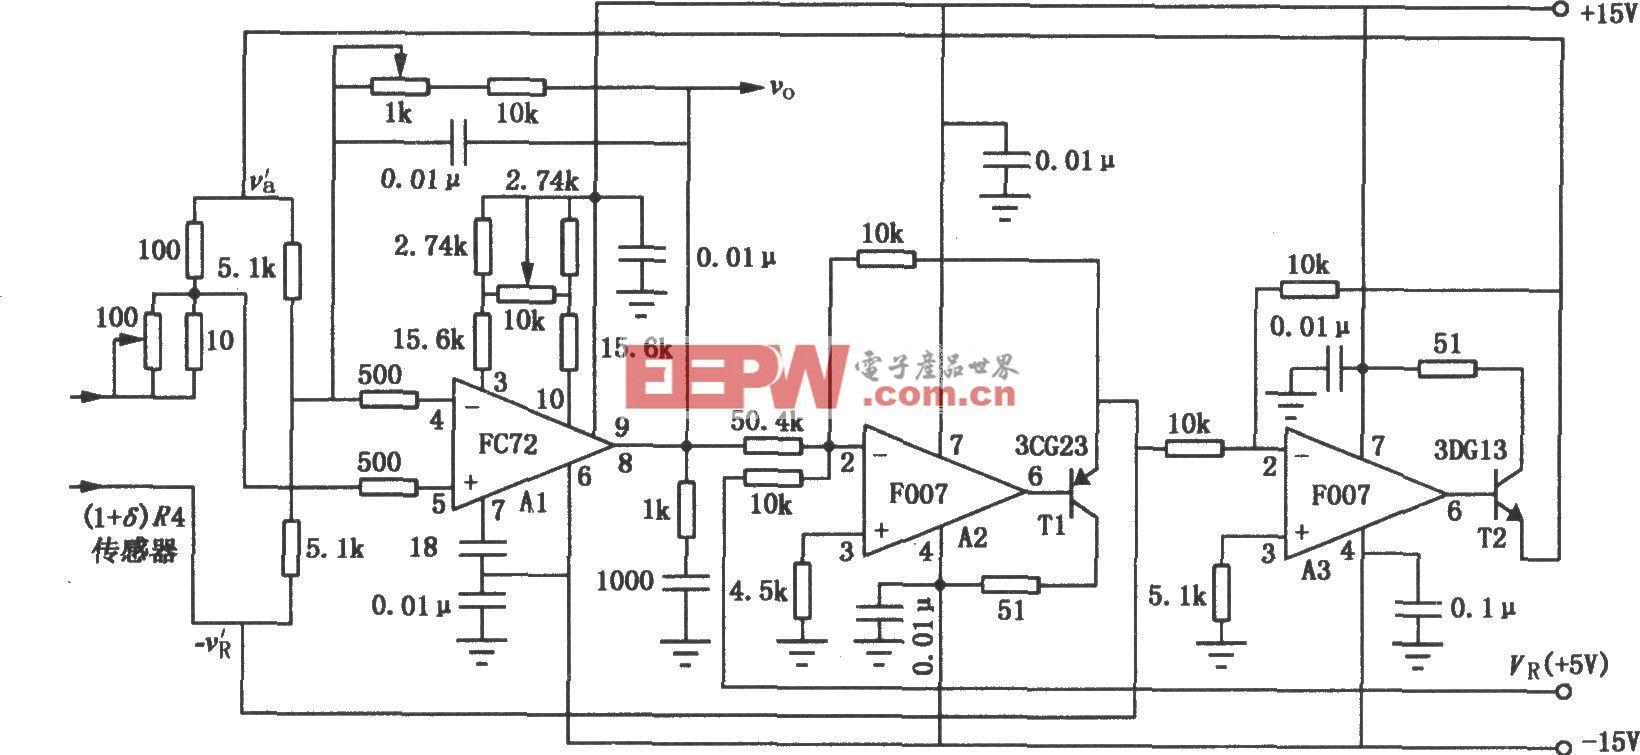 F007组成的高精度线性放大电路